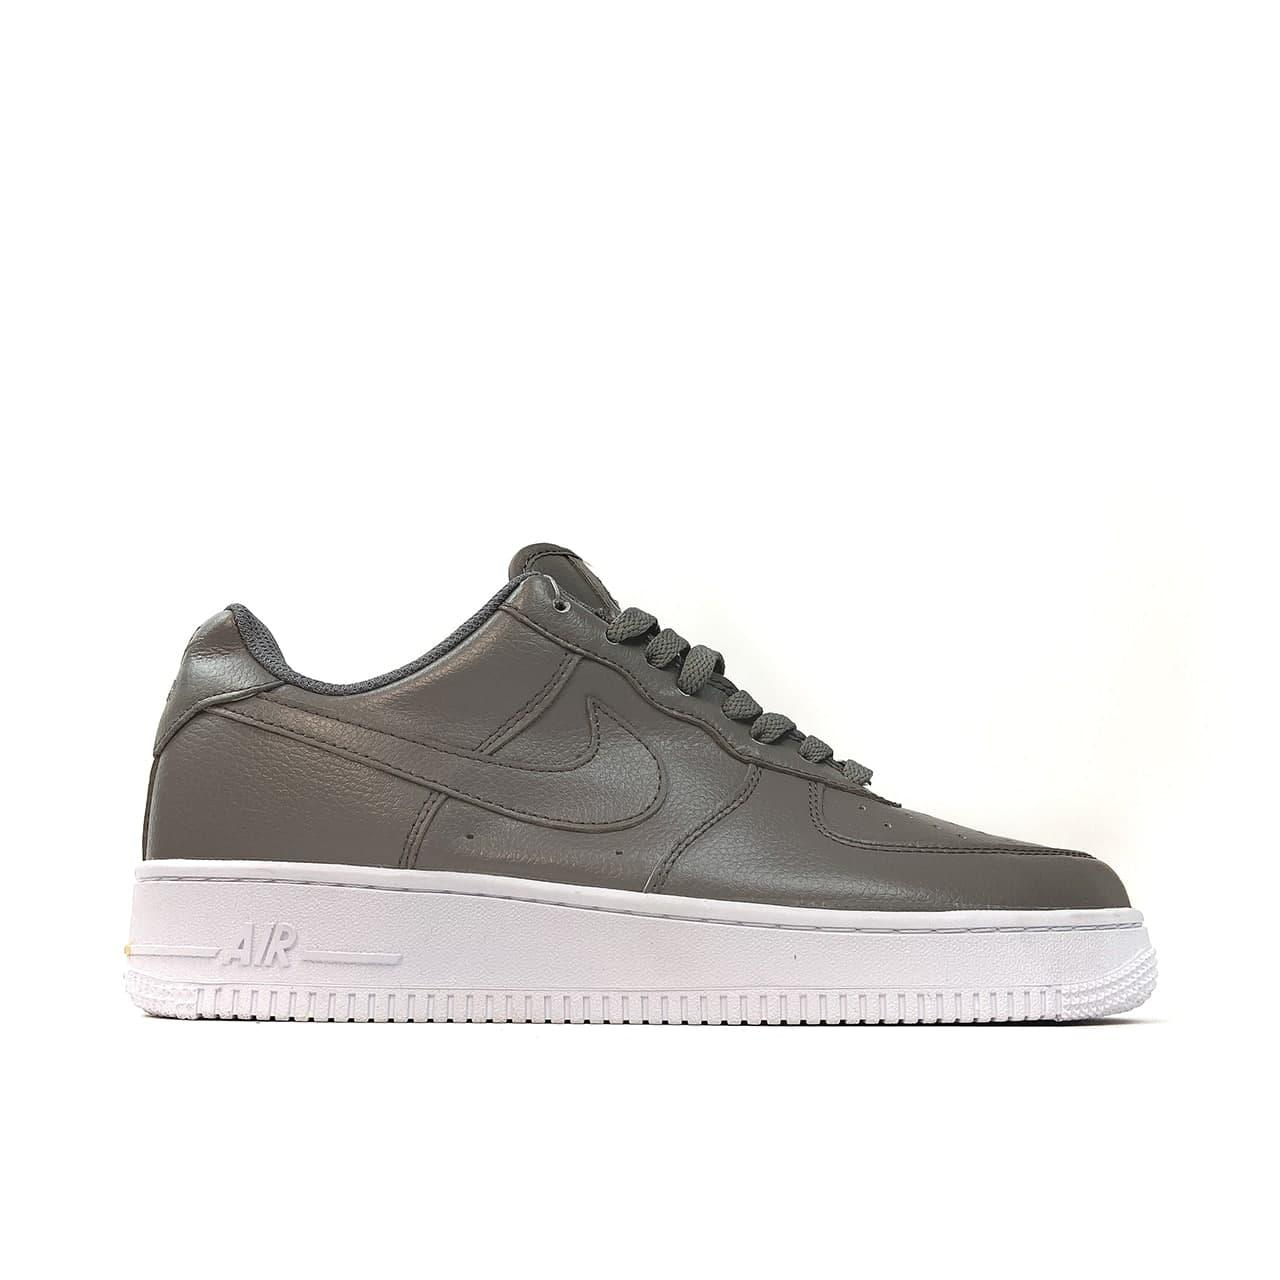 Кроссовки Nike Air Force 1 Low Grey мужские, серого цвета, Найк Аир Форс 41